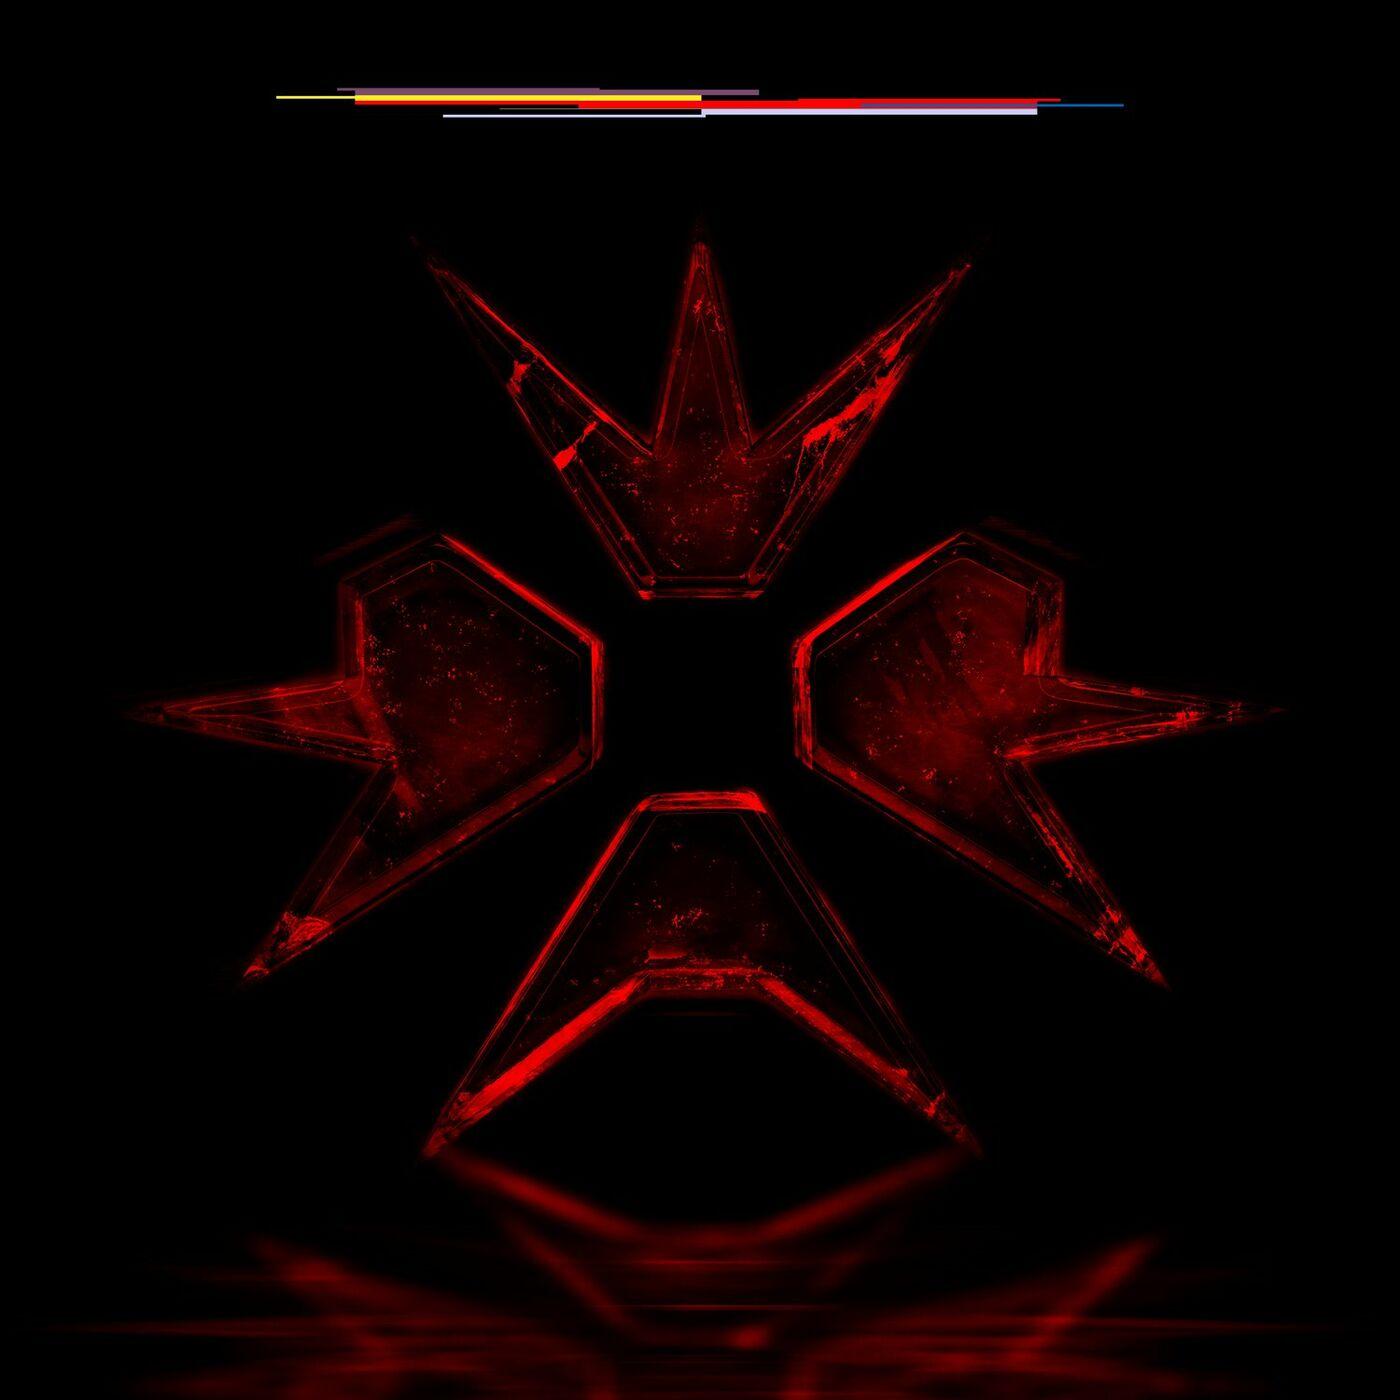 ERRA - House of Glass [single] (2020)